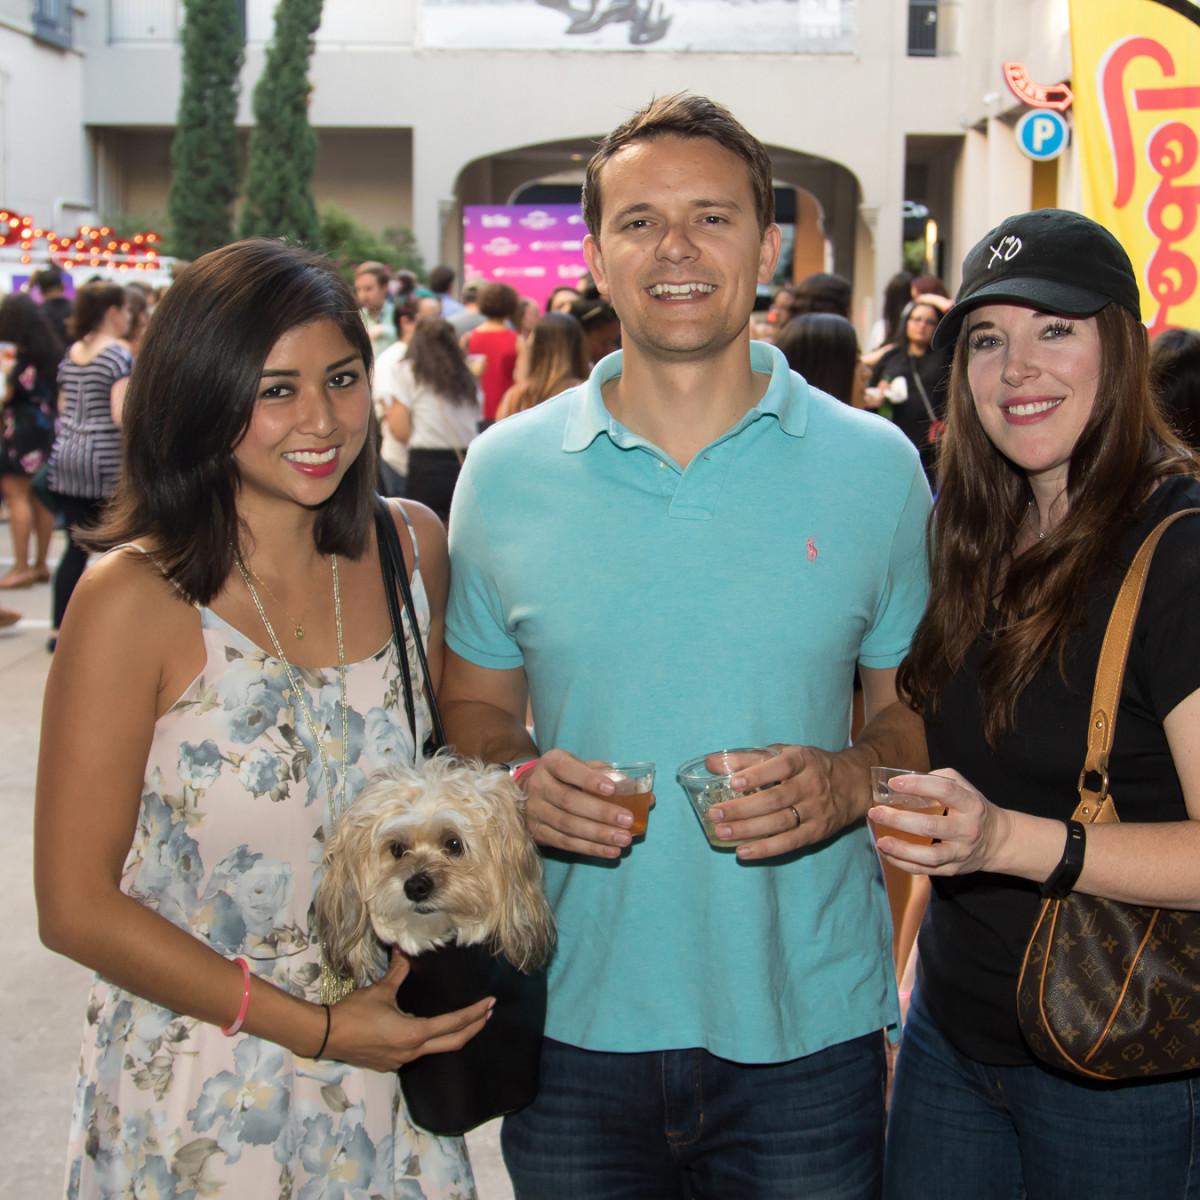 Stephanie Kaye Ramirez, TIm Kilroy, Natalie Gradick